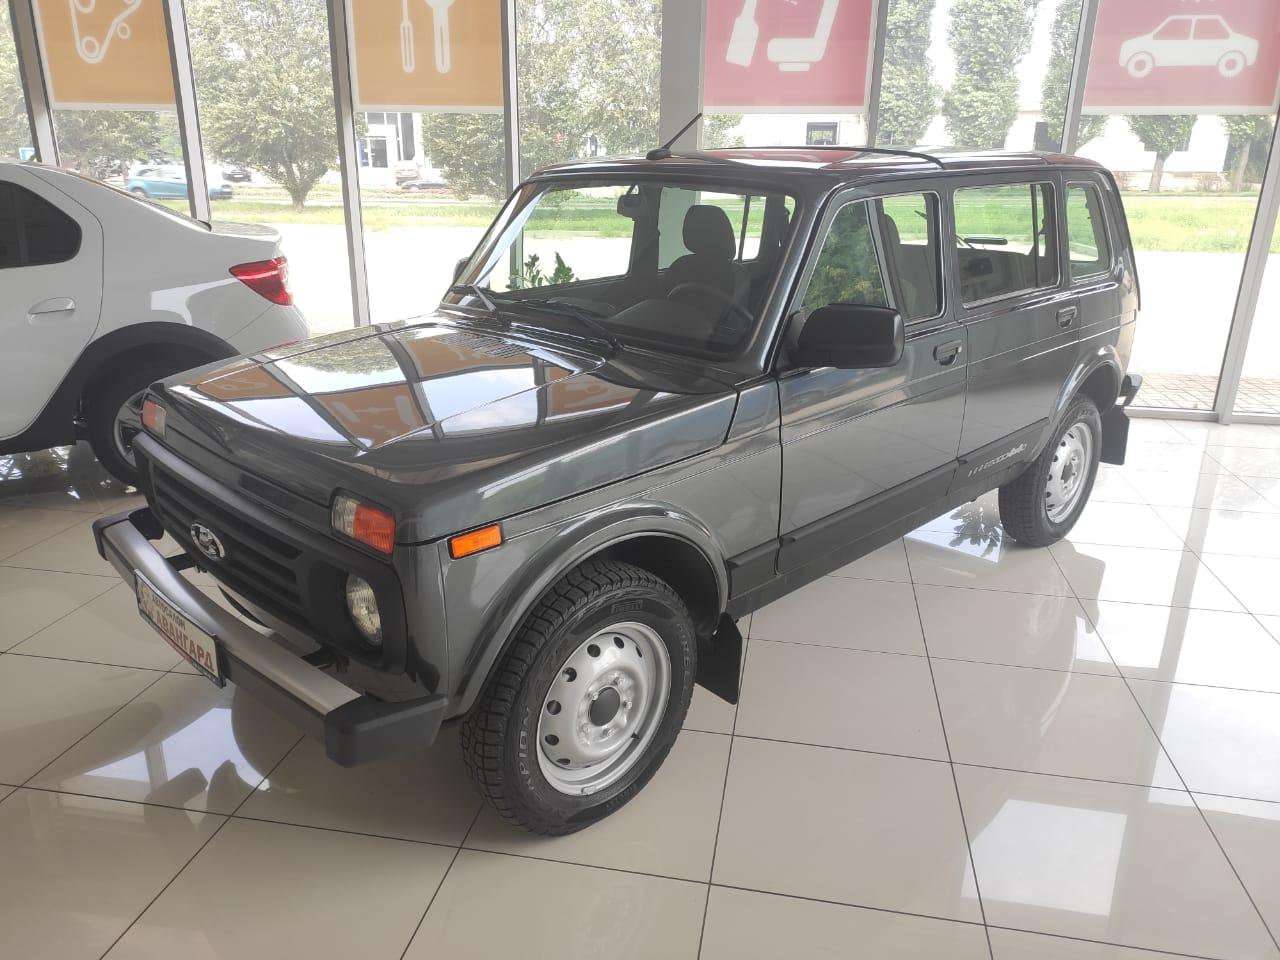 Lada Niva Legend 5 дв. 1.7 л 8 кл., 5МТ. Classic. Серый «Борнео». 2021